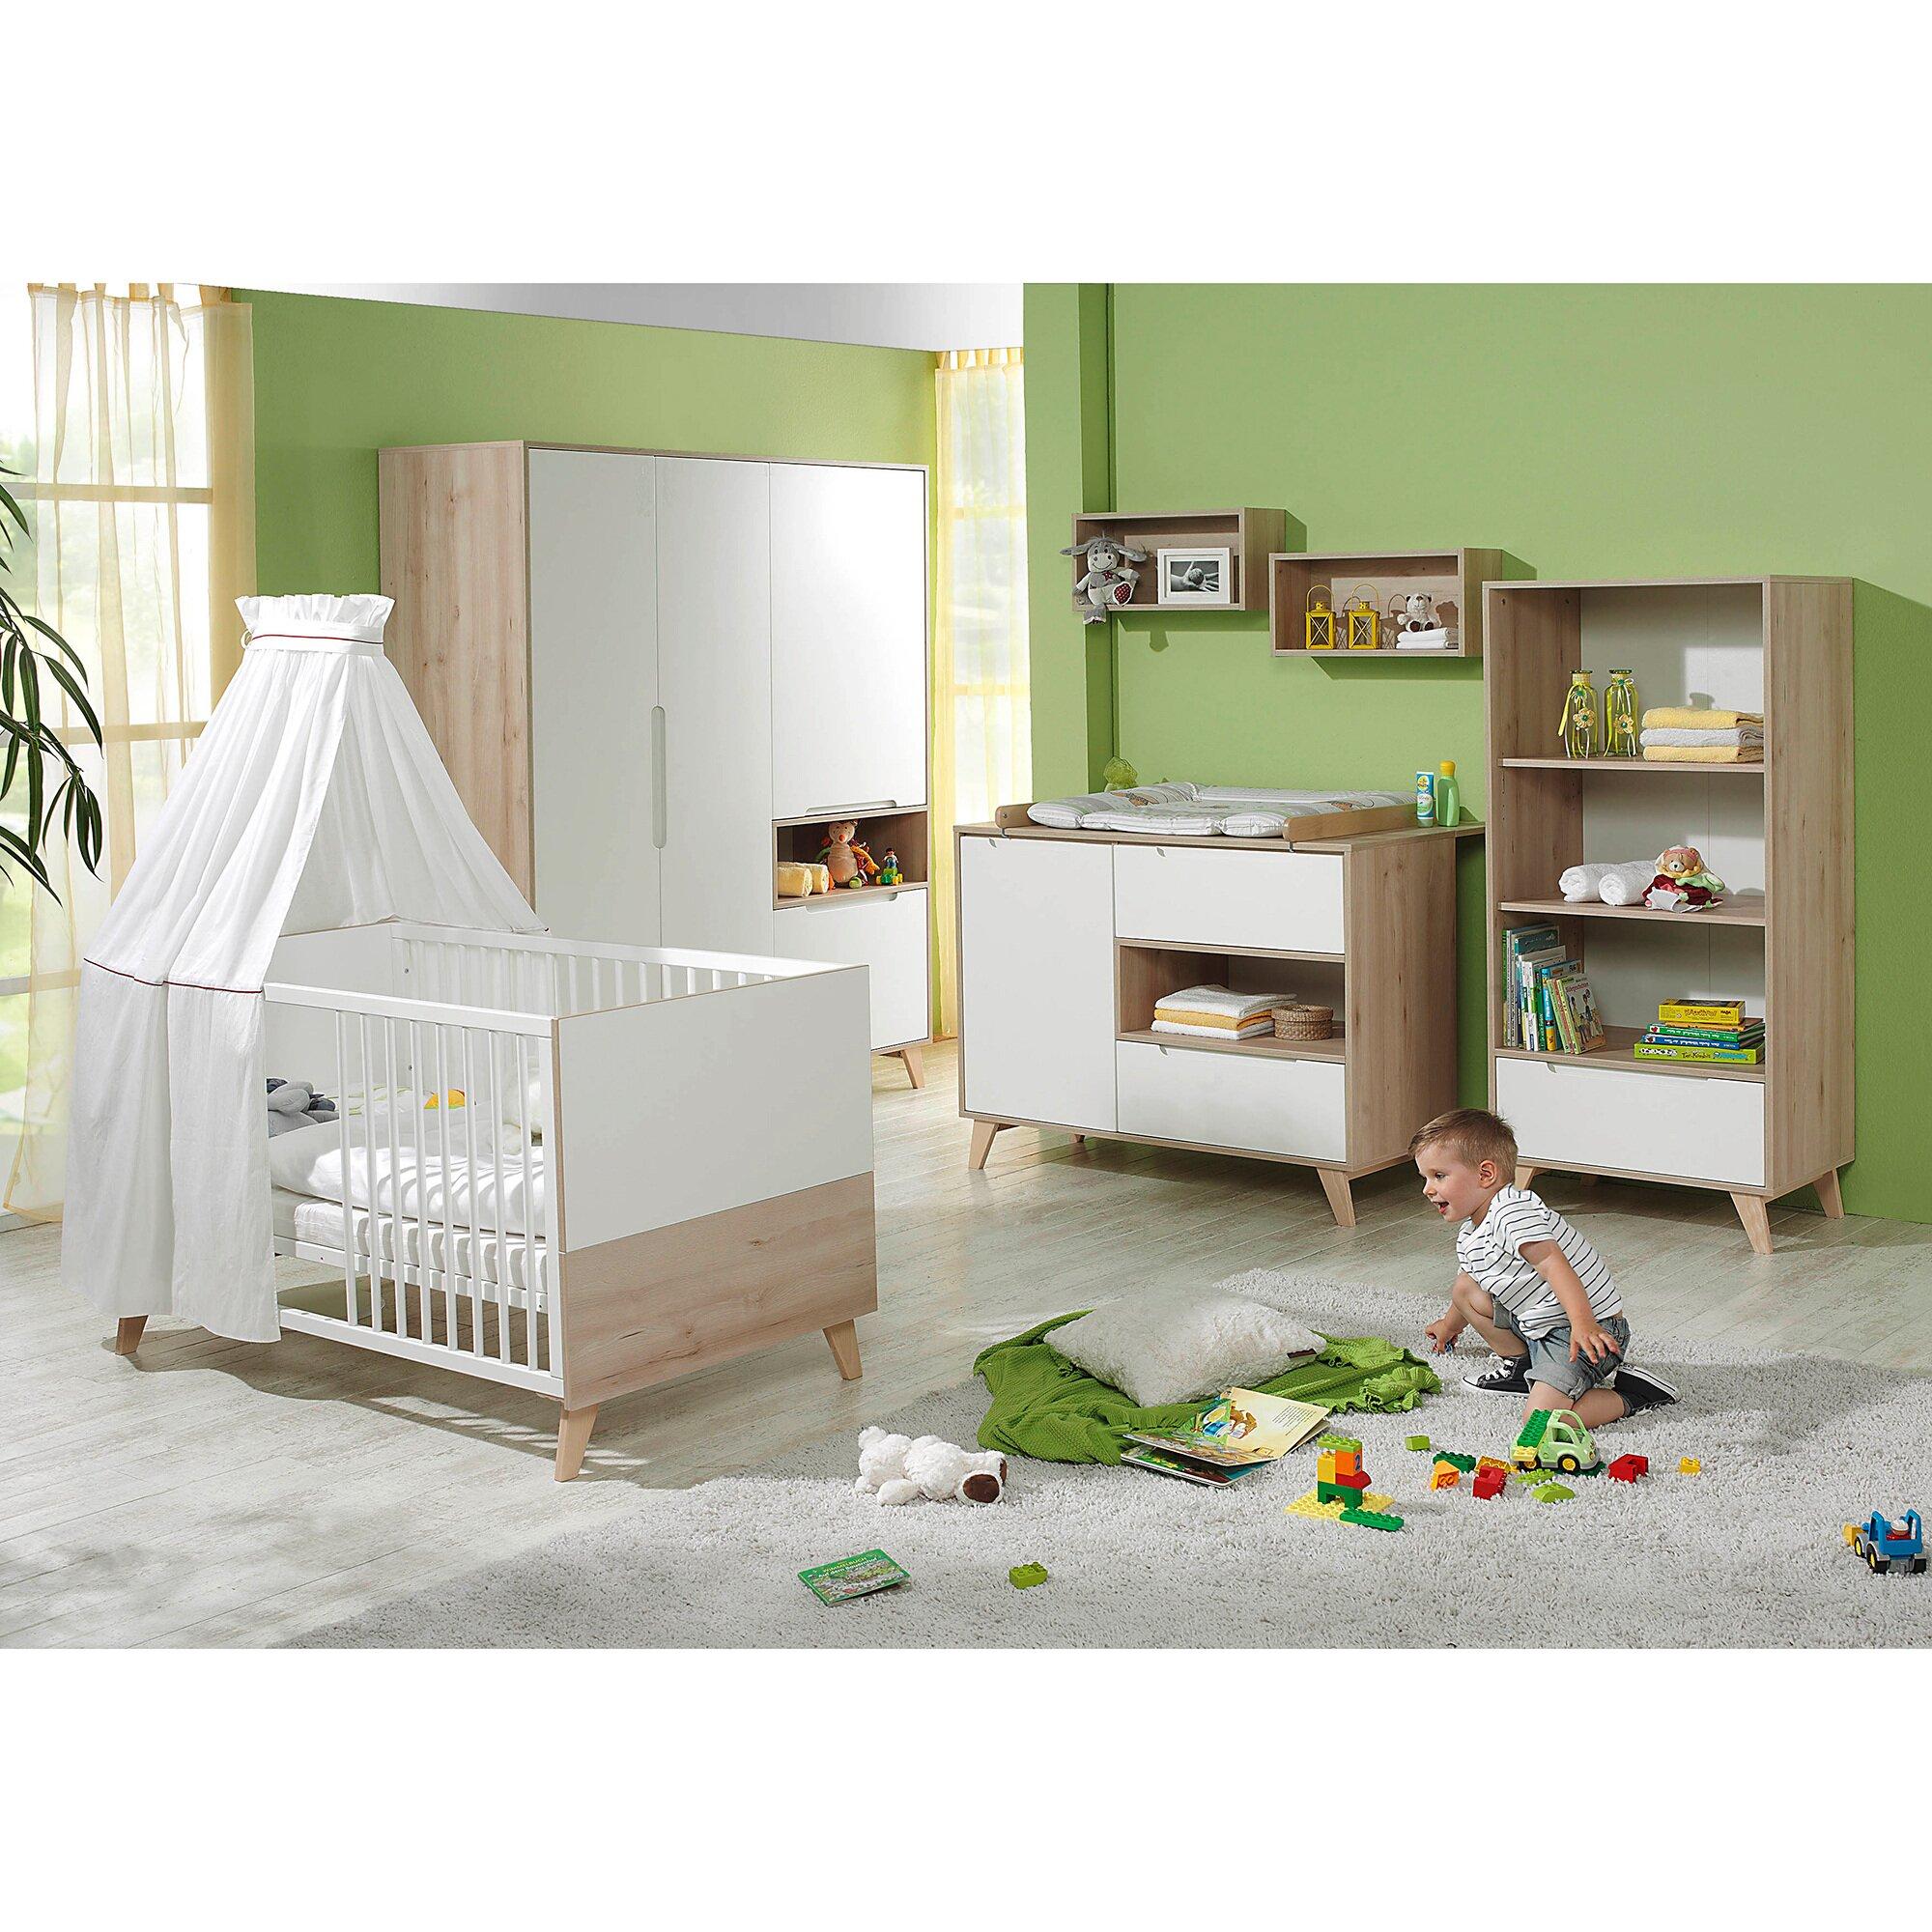 Geuther Komplett-Kinderzimmer METTE 3-tlg.